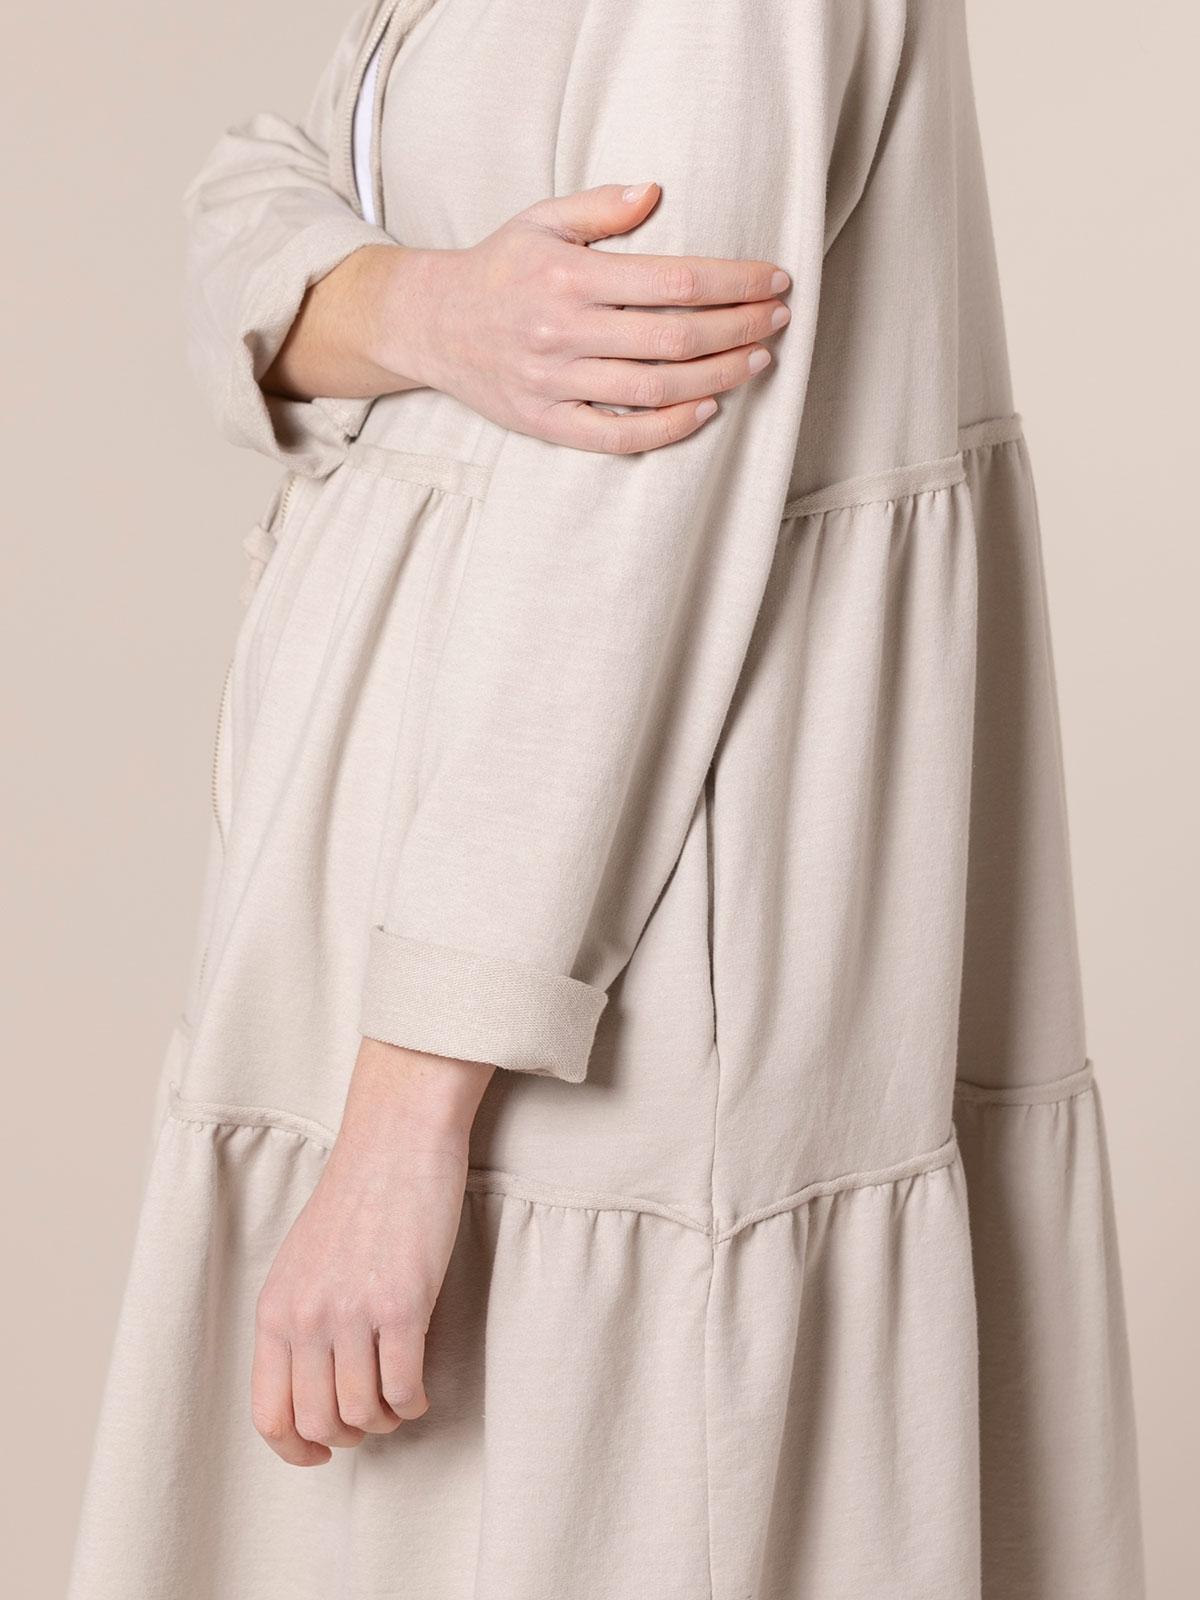 Sudadera mujer larga capucha y cremallera Beige